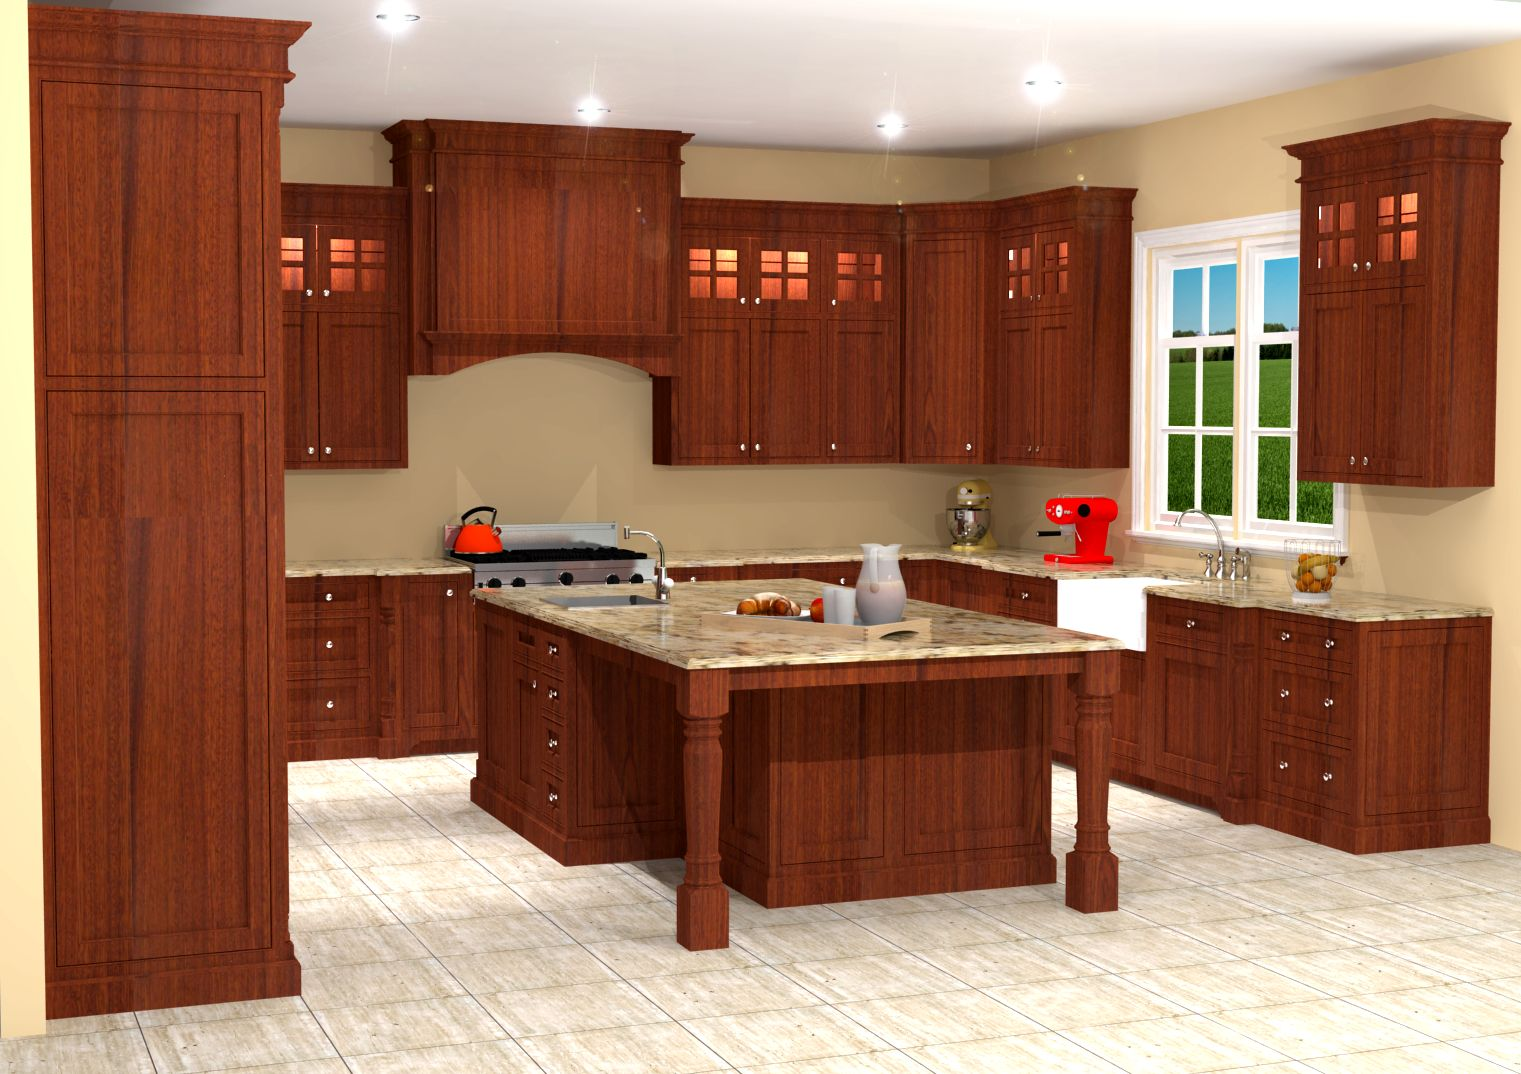 Inset Mahogany Kitchen Design / Rendering | Nick Miller Design